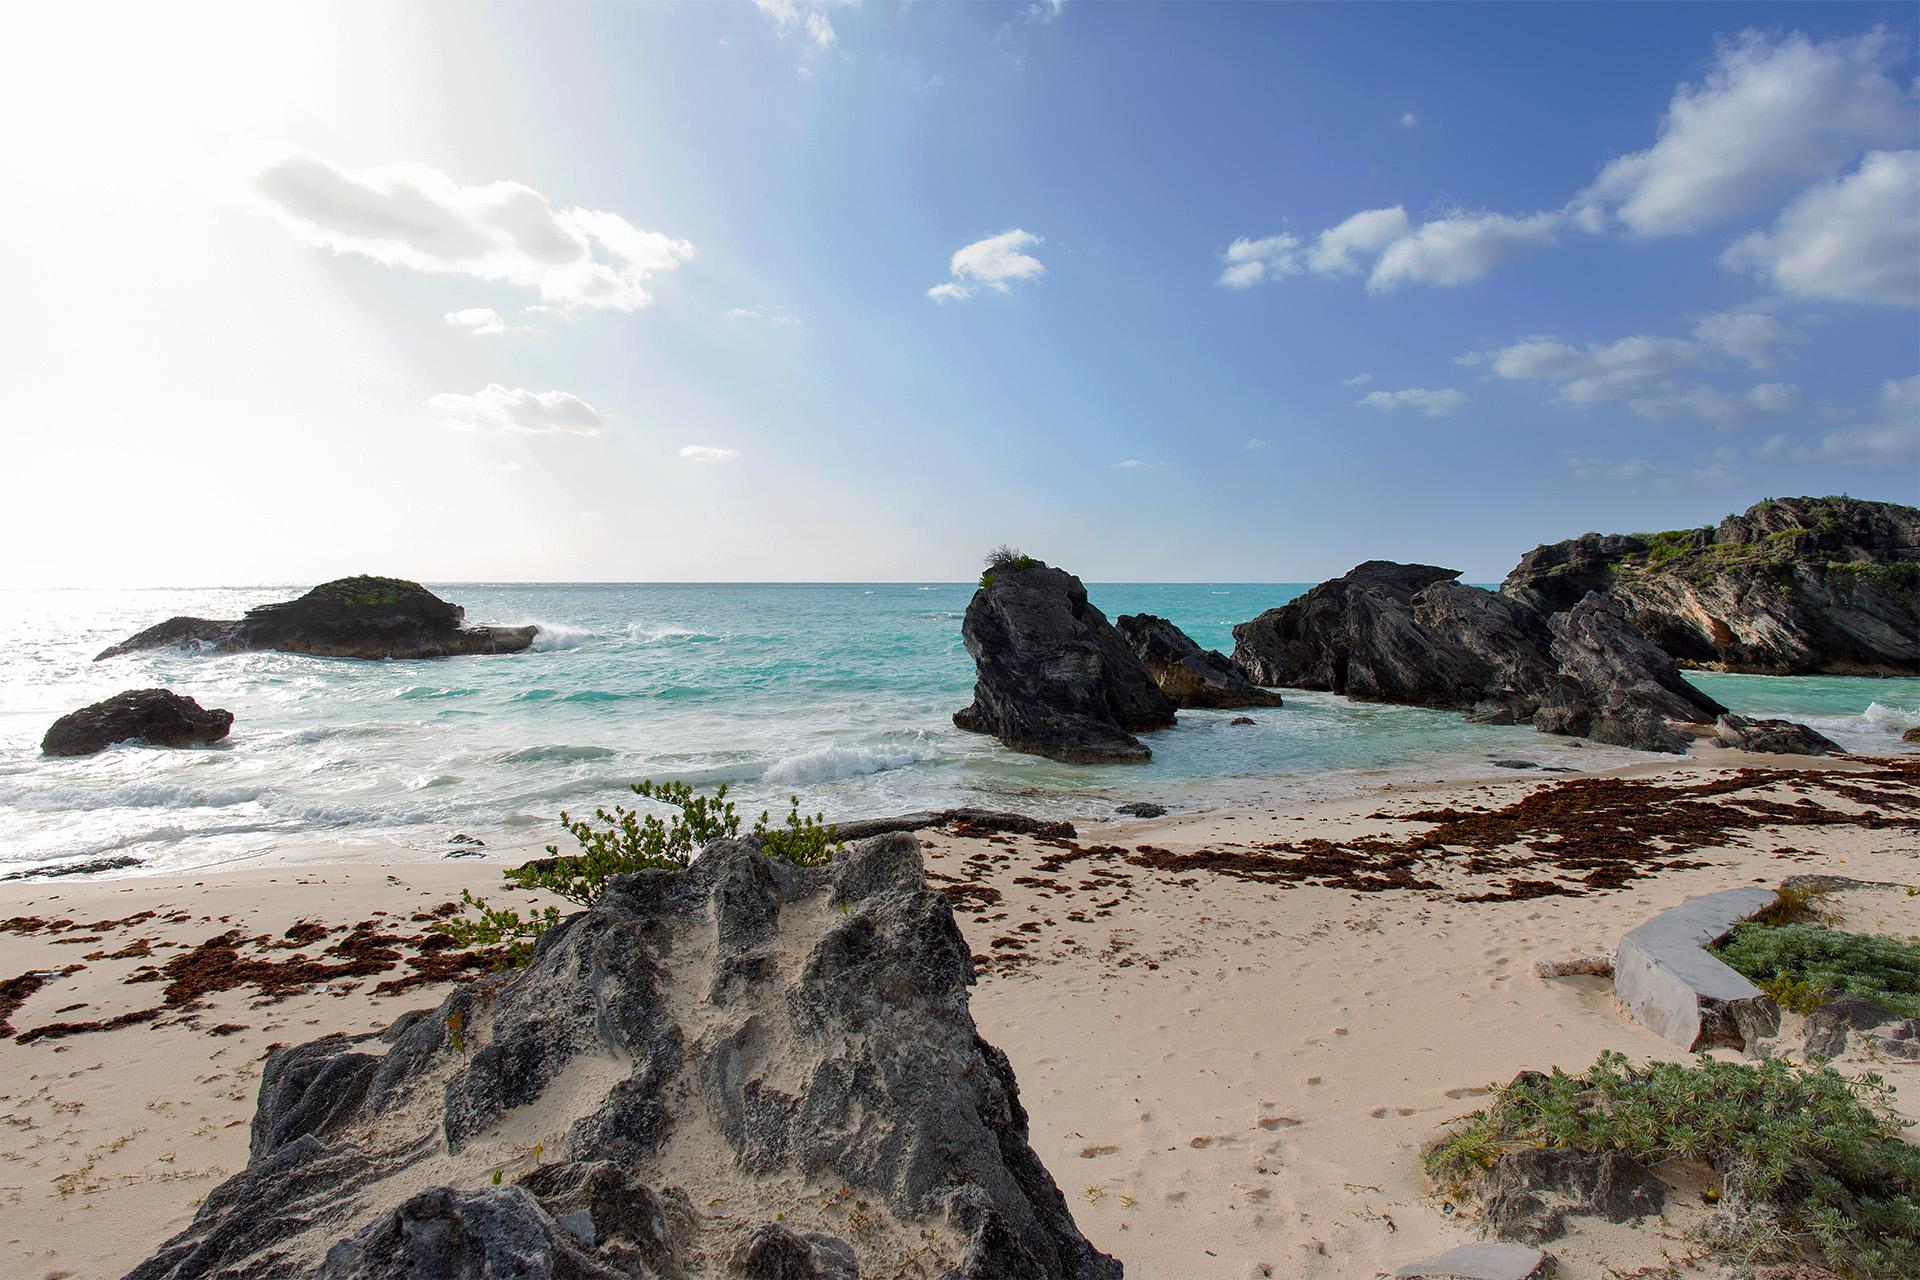 Johnson's Bay Beach, Bermuda.